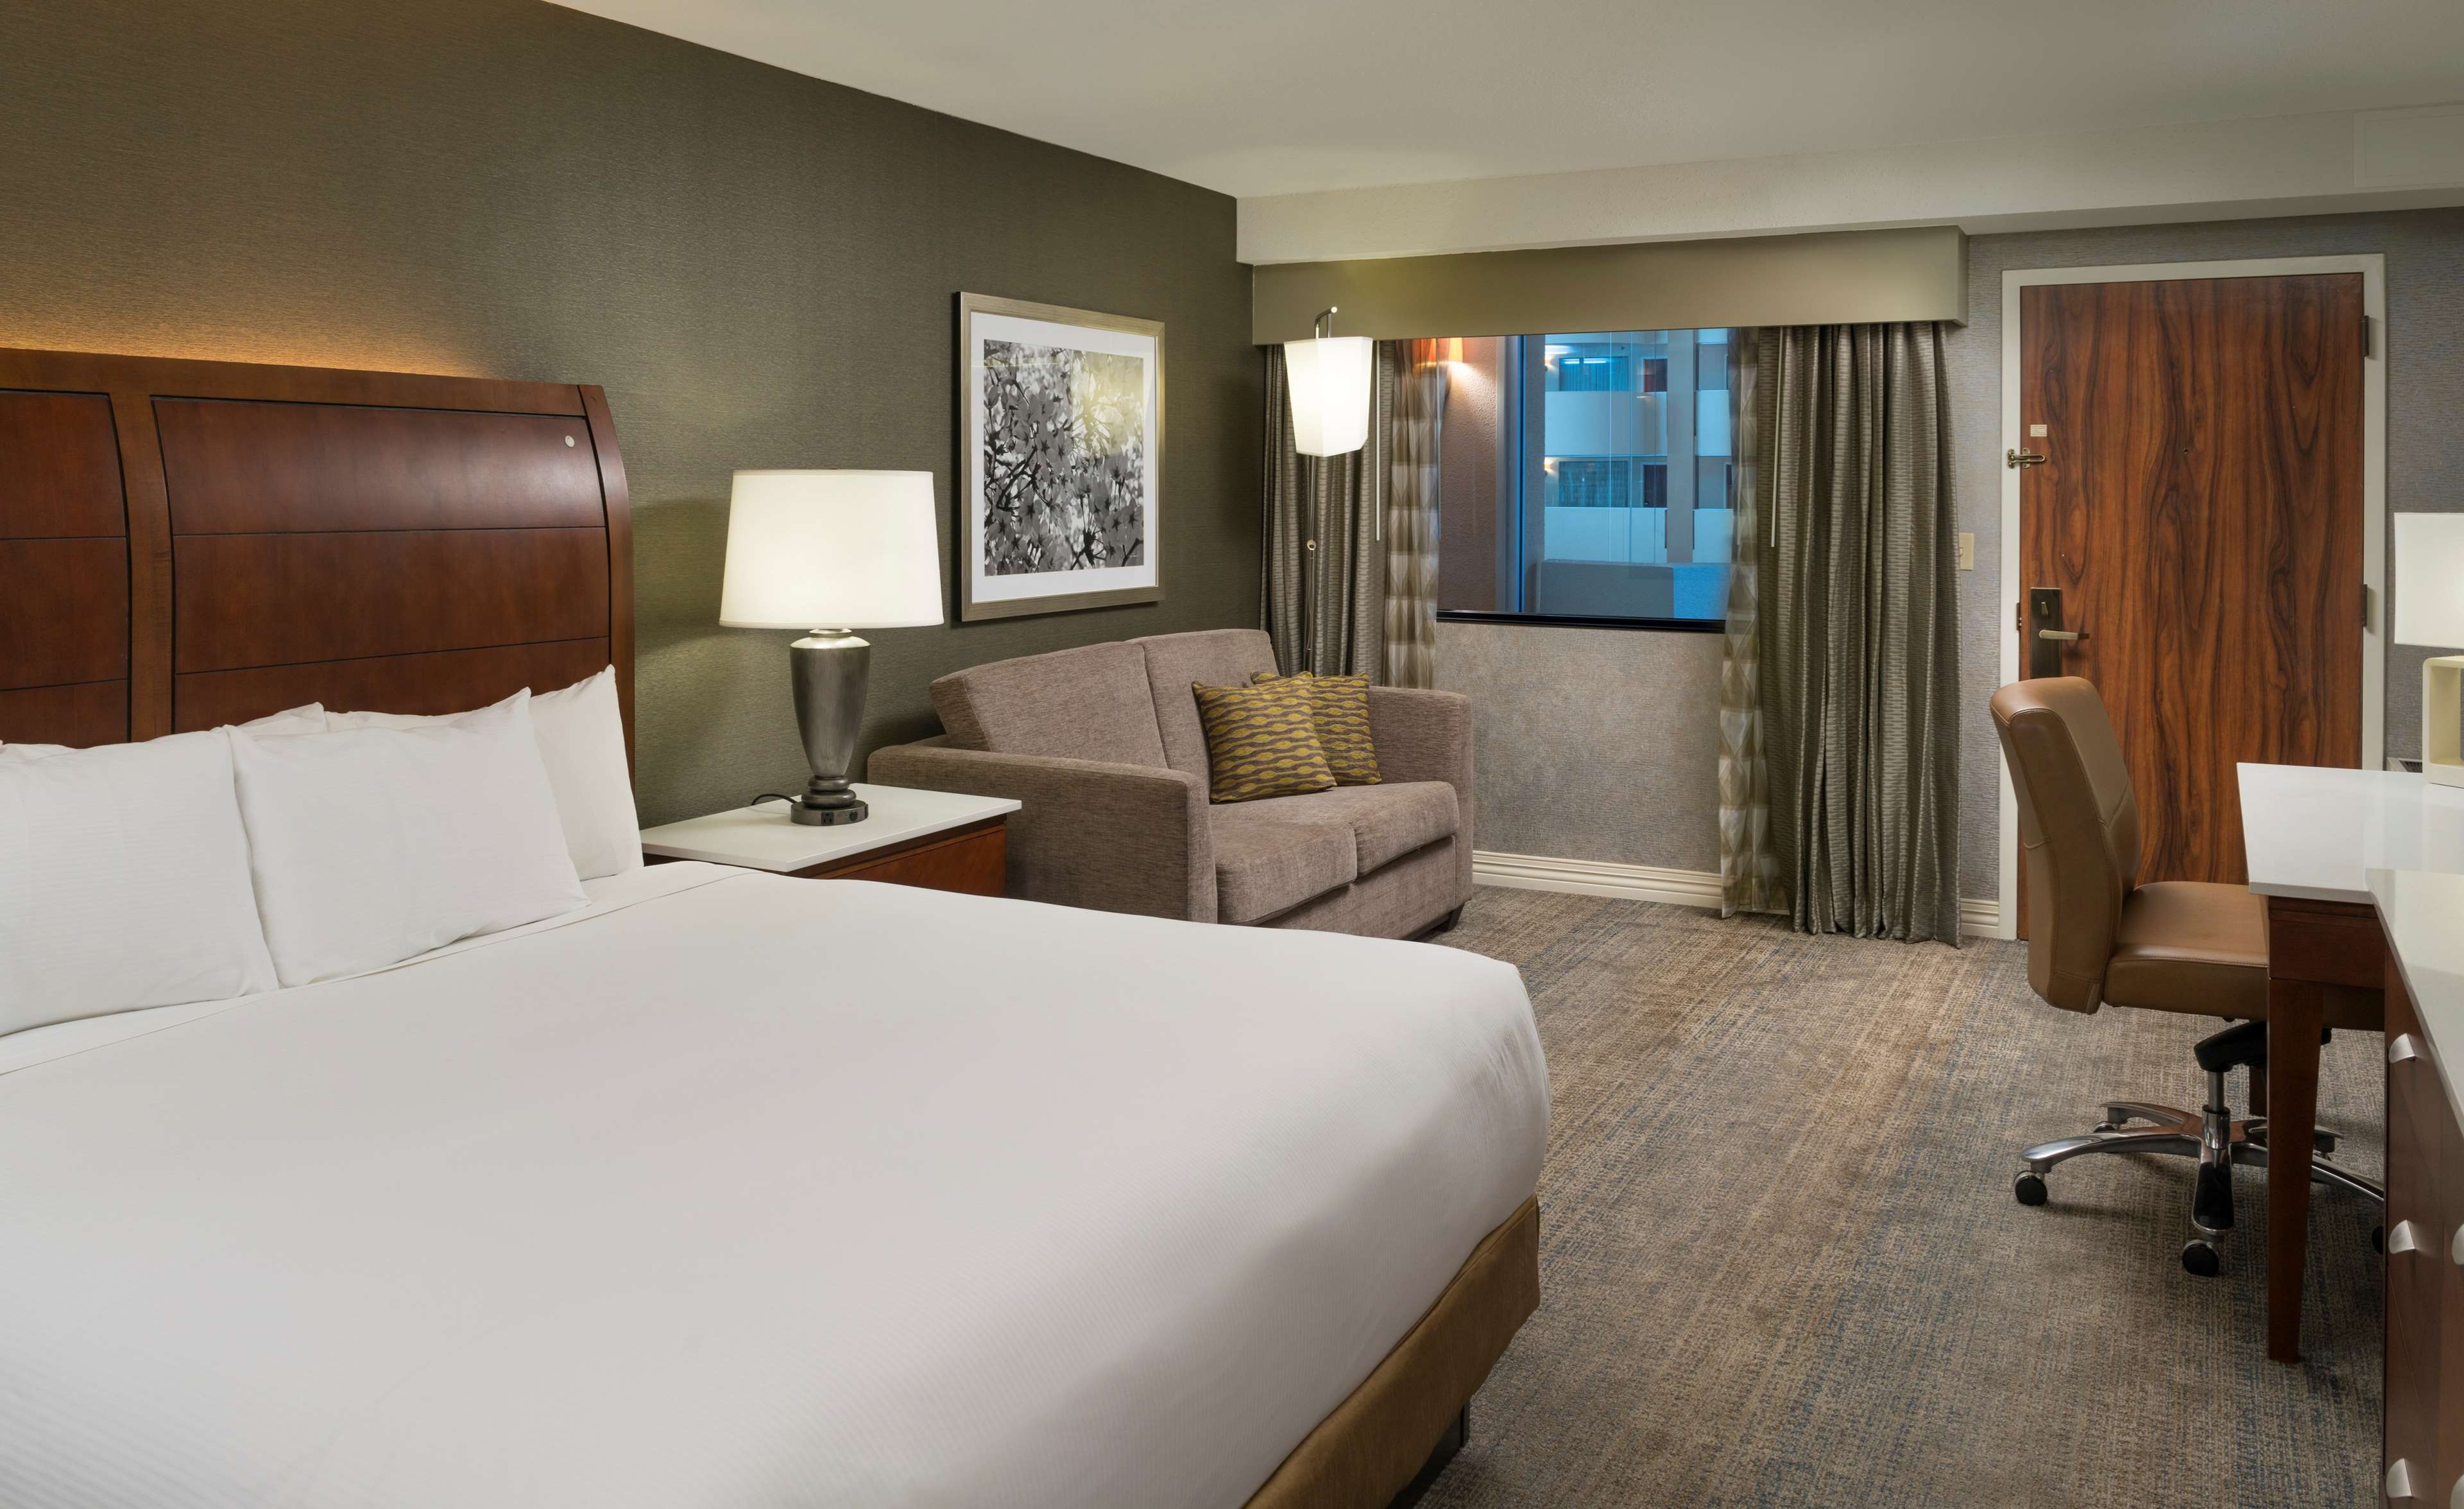 Hilton Washington DC/Rockville Hotel & Executive Meeting Ctr image 31